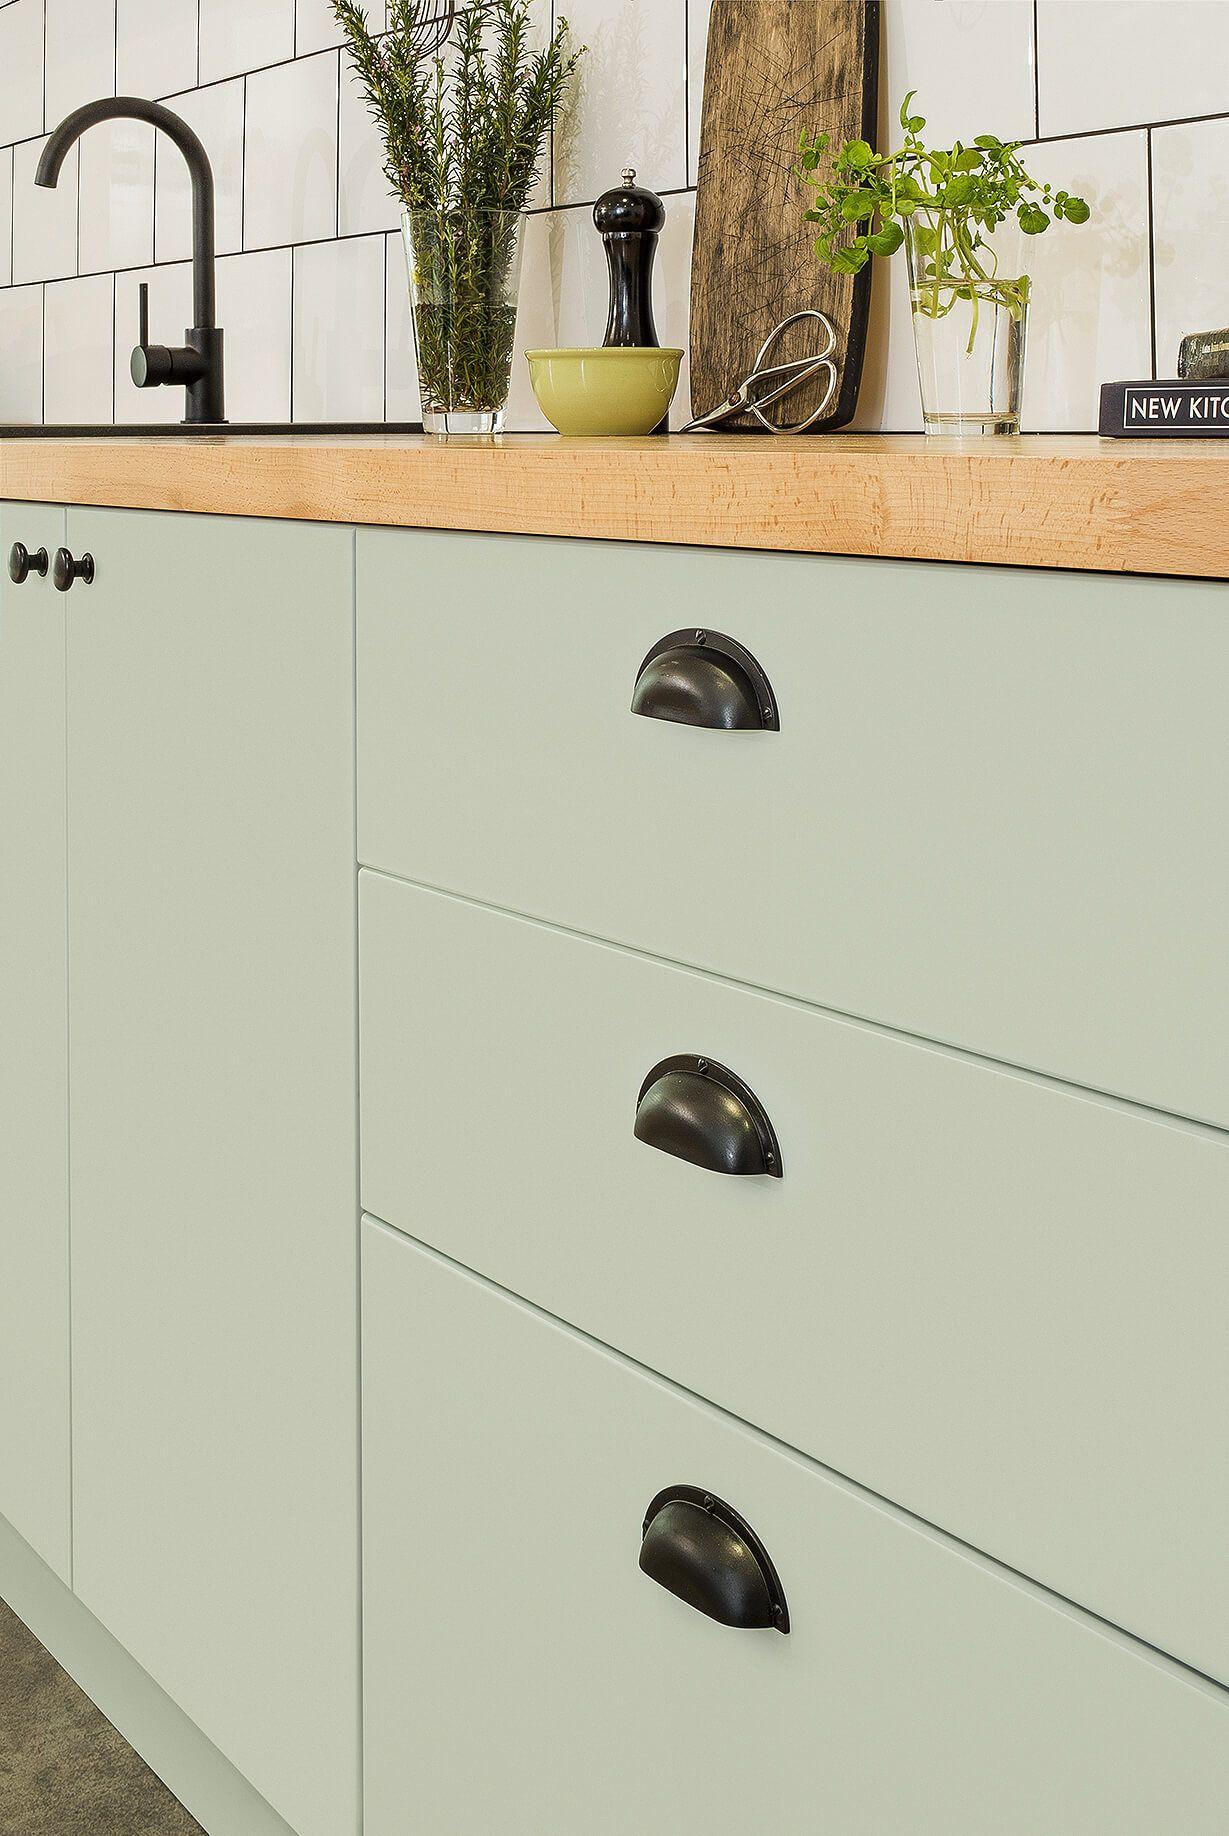 retro style kaboodle kitchen flatpack kitchen kaboodle kitchen bunnings home decor on kaboodle kitchen layout id=47492